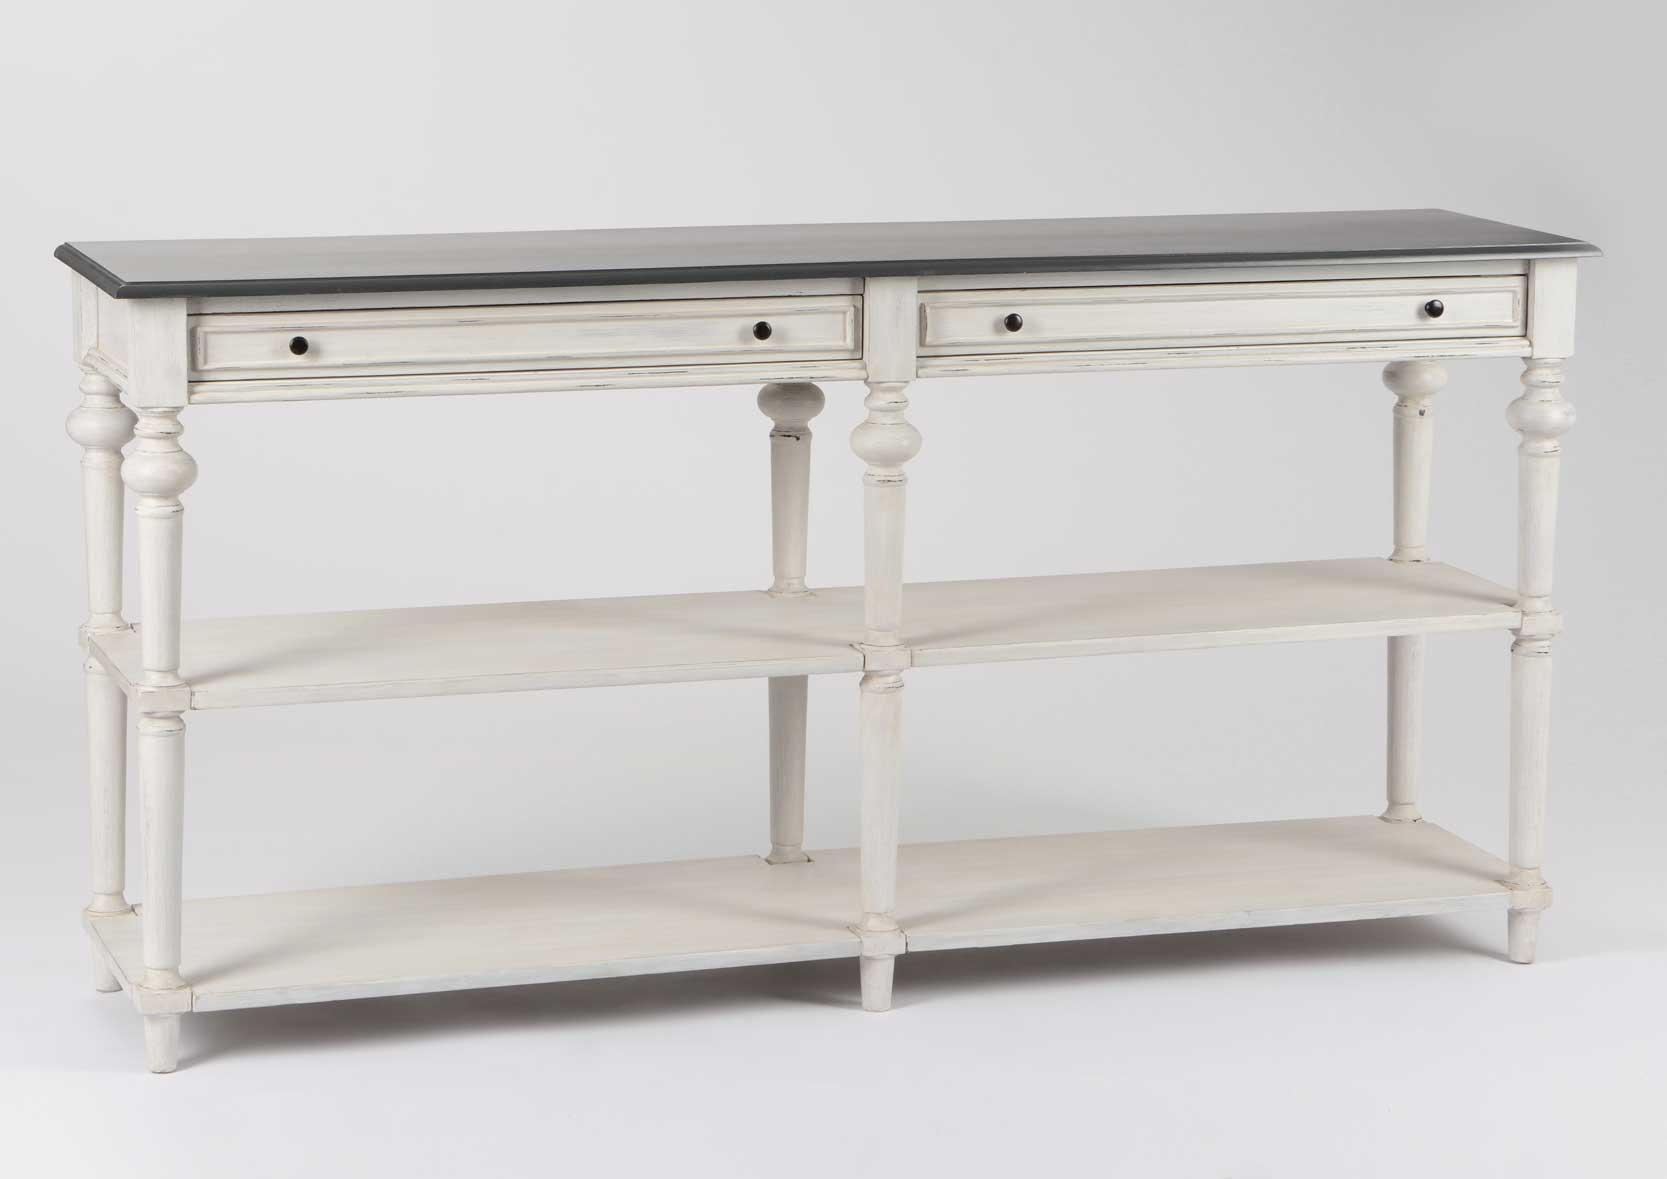 magasin meuble orleans interesting beau magasin ustensile de cuisine orleans hgd meuble de. Black Bedroom Furniture Sets. Home Design Ideas